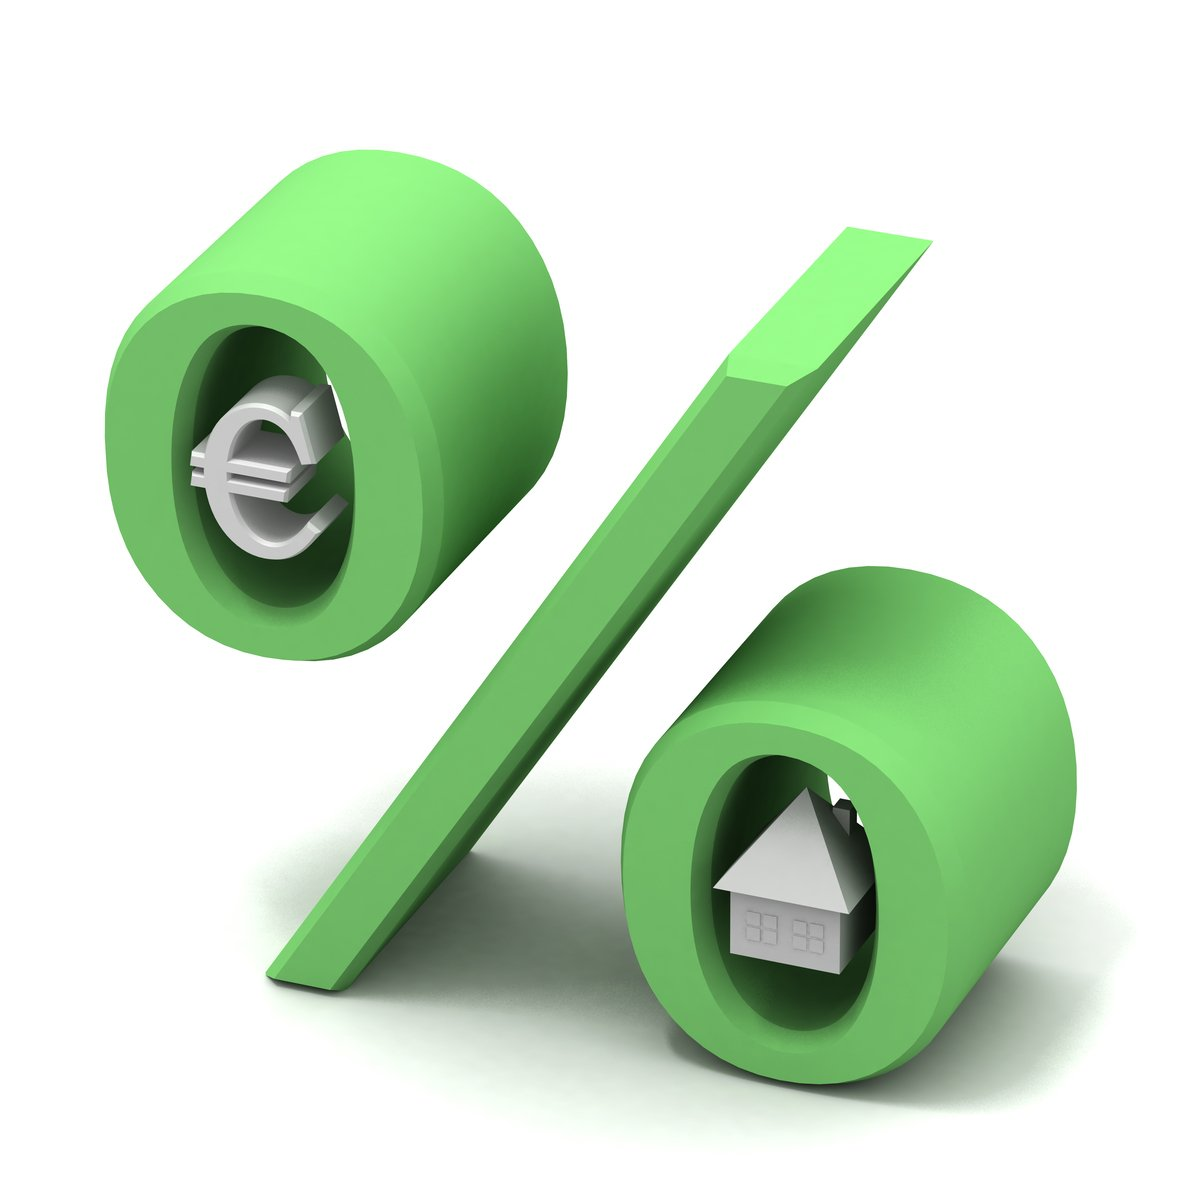 Hypotheekrente omlaag